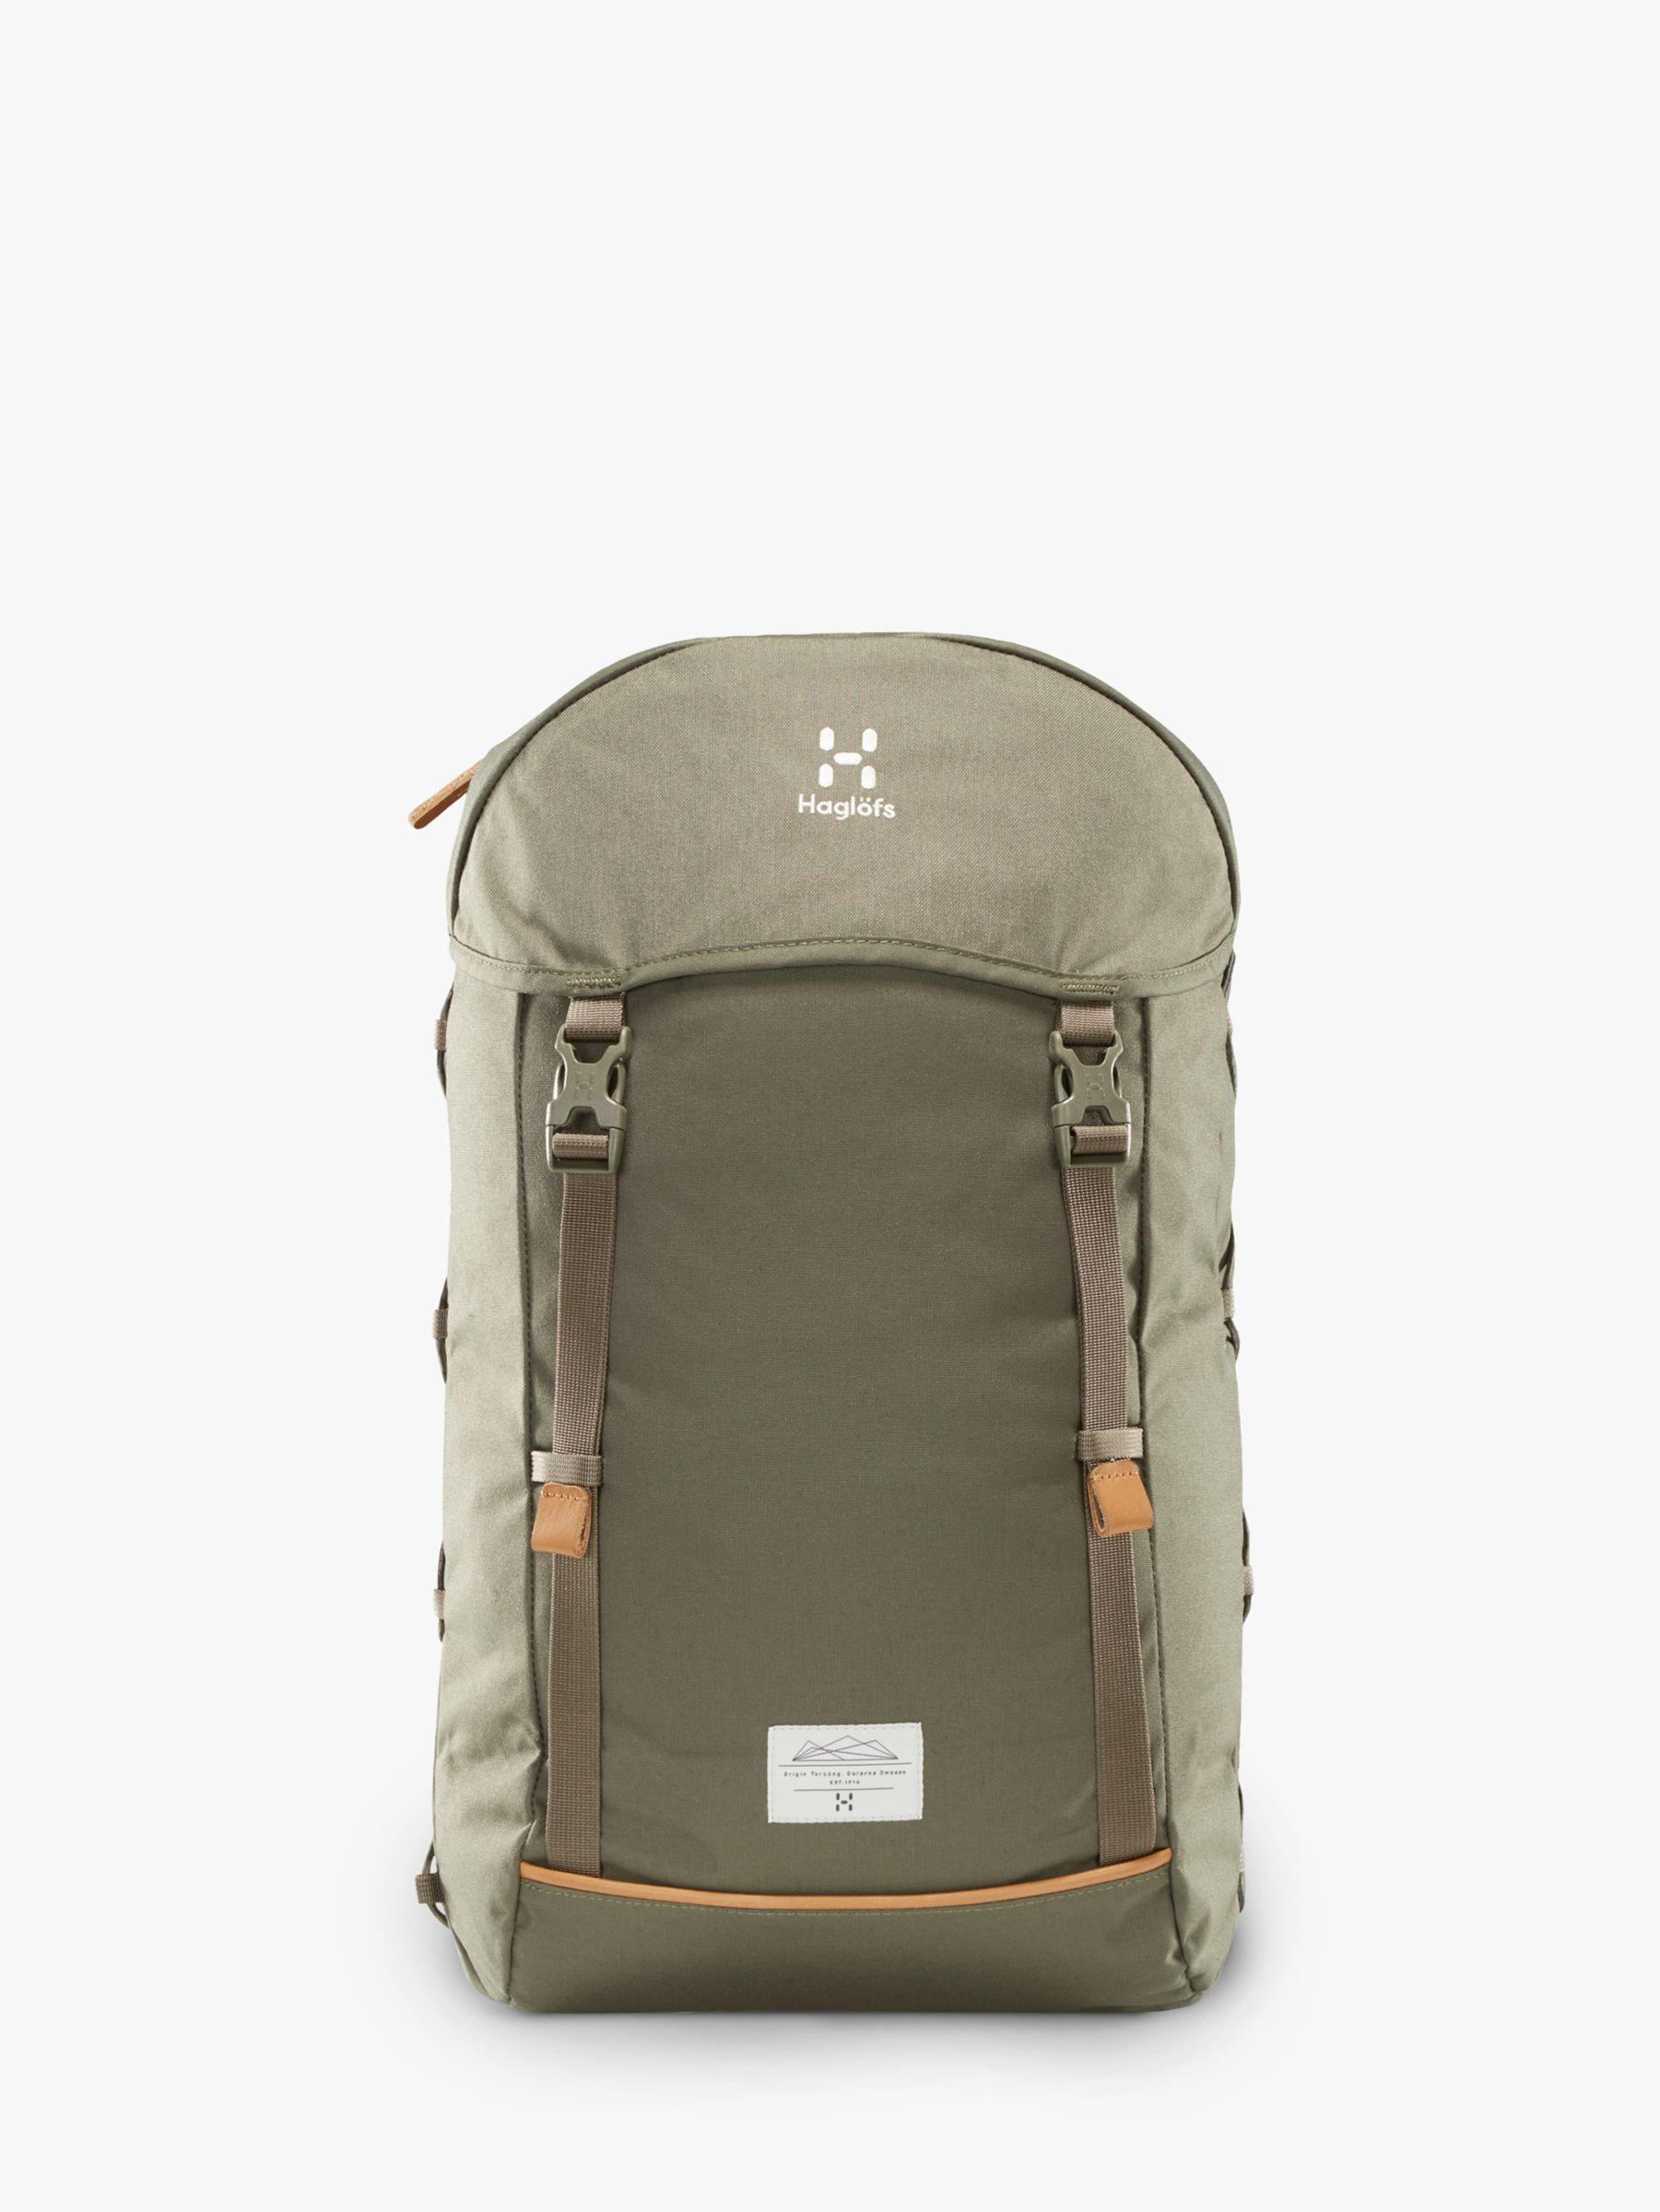 Haglofs Haglöfs ShoSho 26L Backpack, Medium